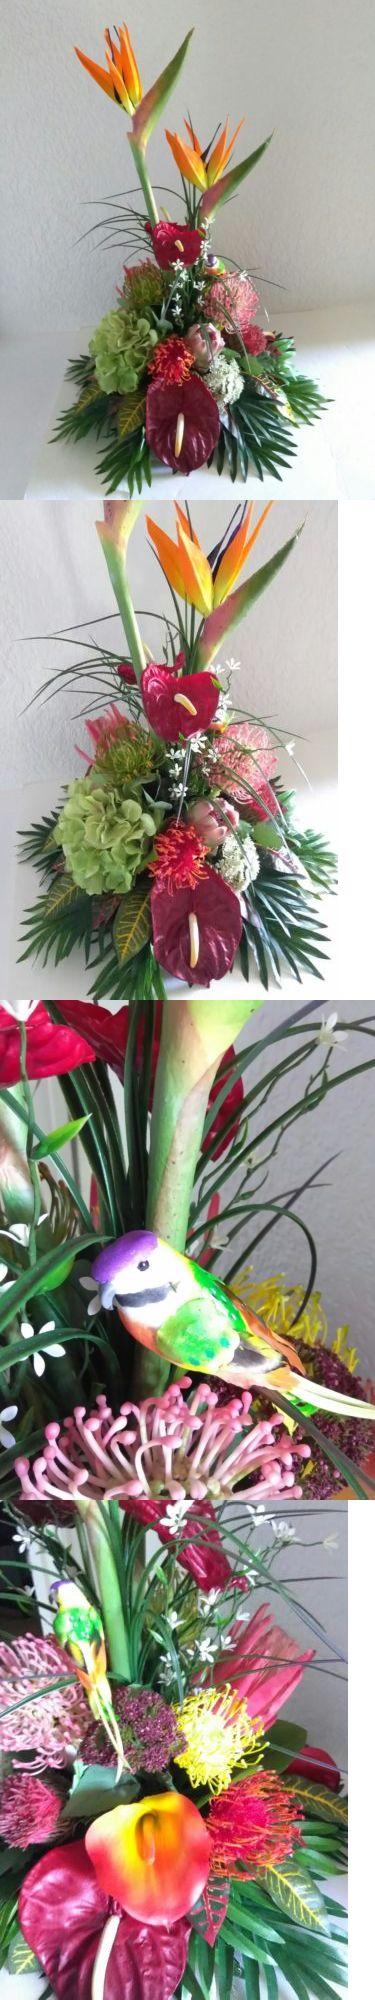 Floral D cor 4959: Tropical Silk Flower Floral Arrangement, Hotel Office Decor -> BUY IT NOW ONLY: $85.95 on eBay!